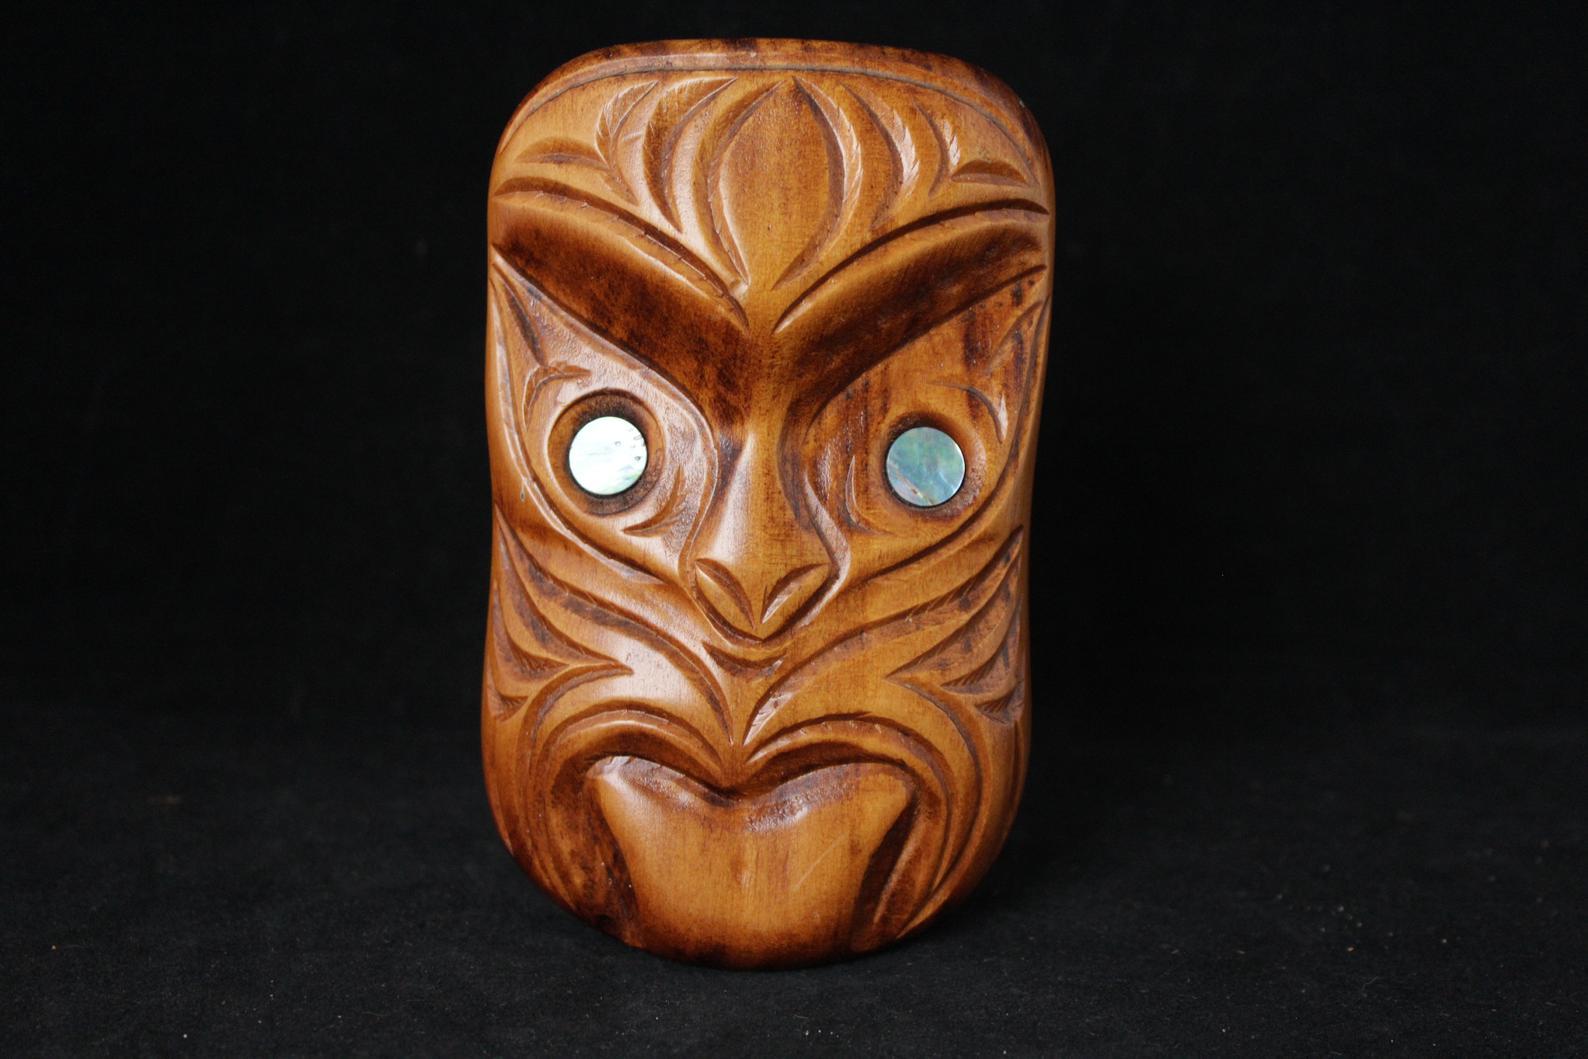 Carved Wood Hawaiin Tribal Head Figurine With Abalone Shell Eyes